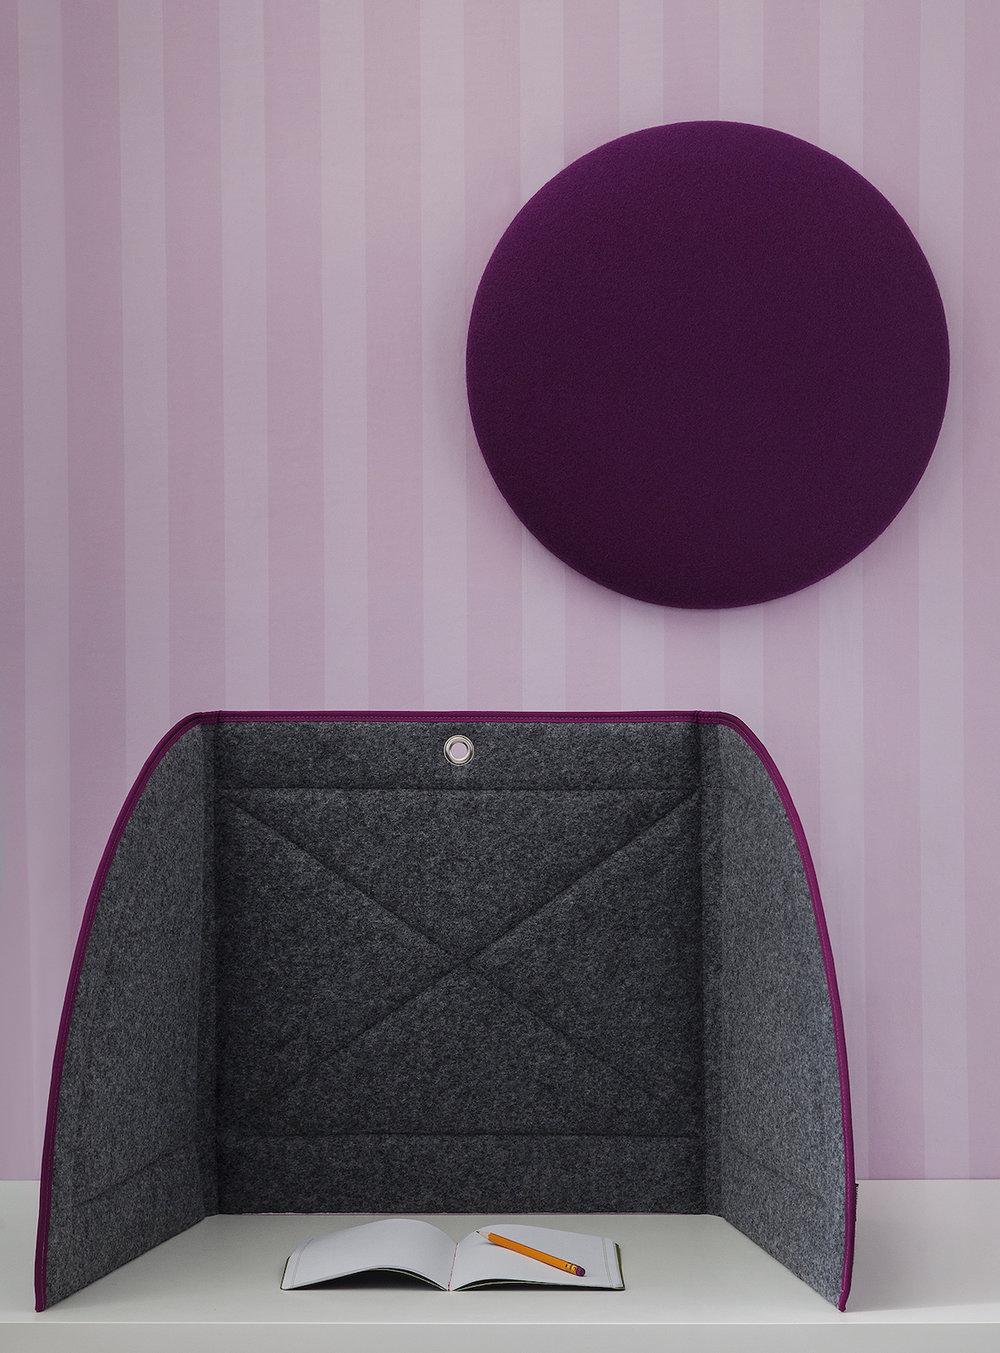 Myplace gra Woolbubbles rosa.jpg